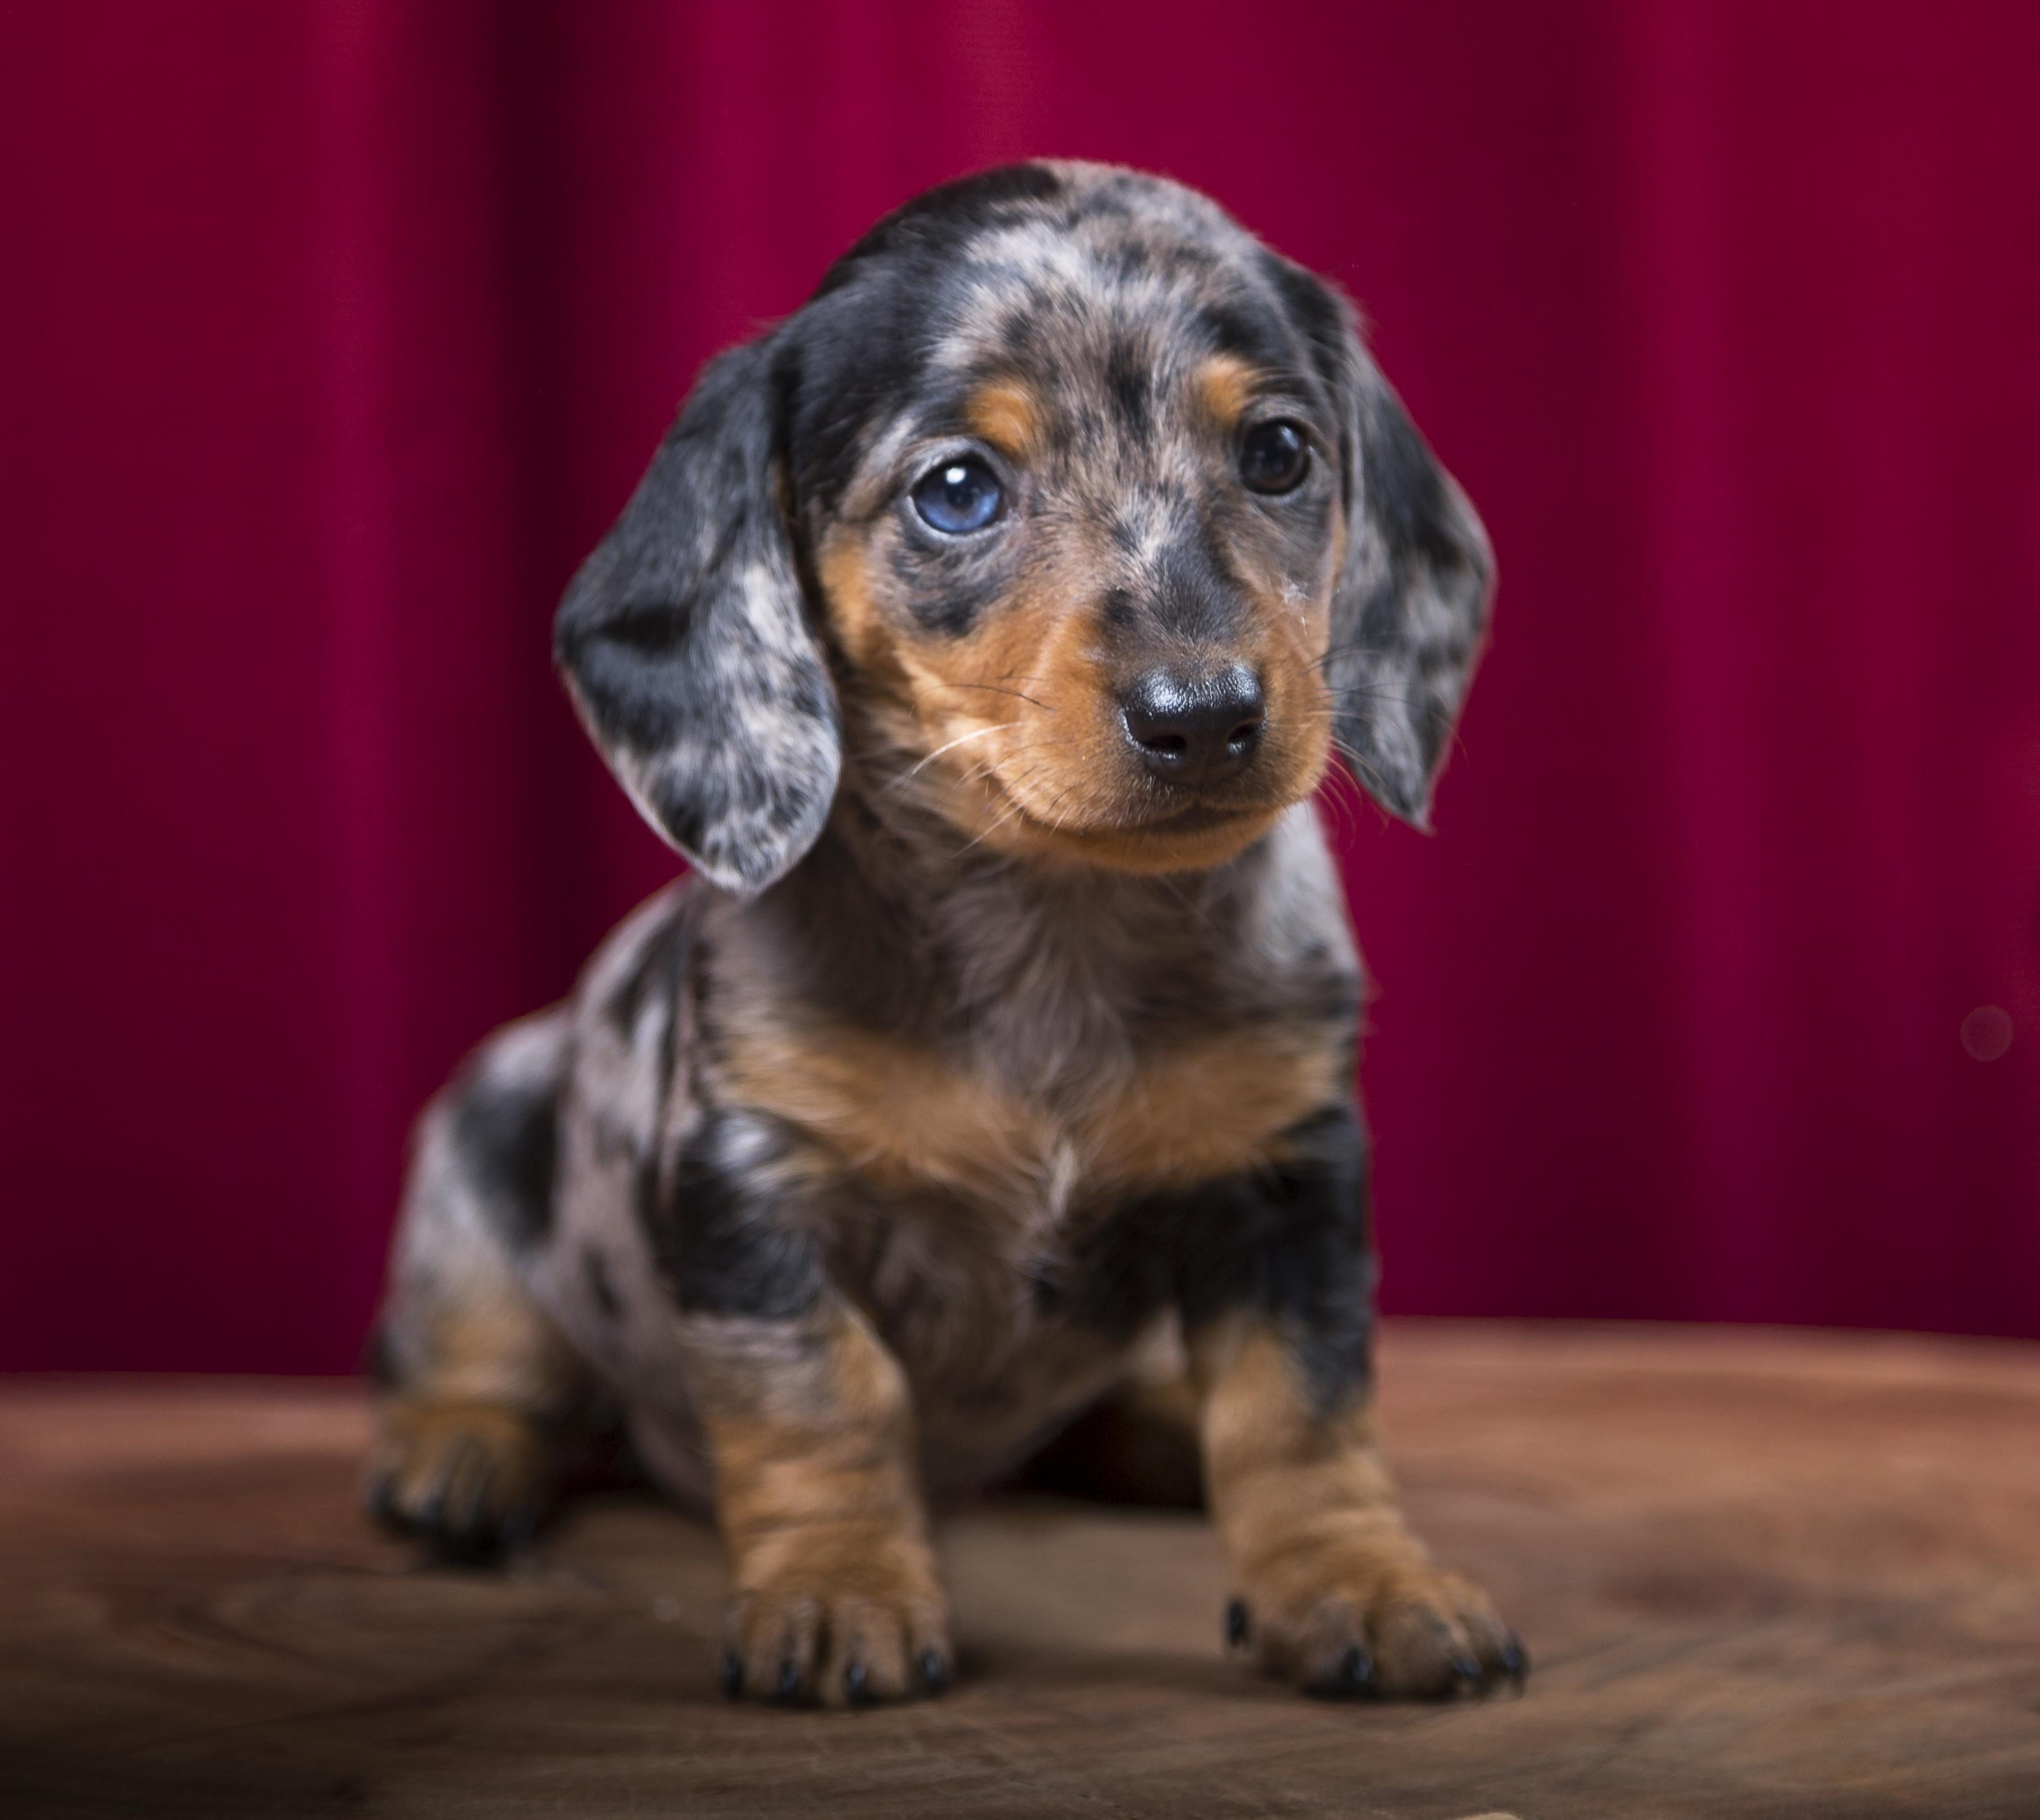 Cute Lil Sausage Dog With A Dappled Blue Eye Http Ift Tt 2jiuzn8 Dachshund Pets Cute Little Dogs Dachshund Puppy Black